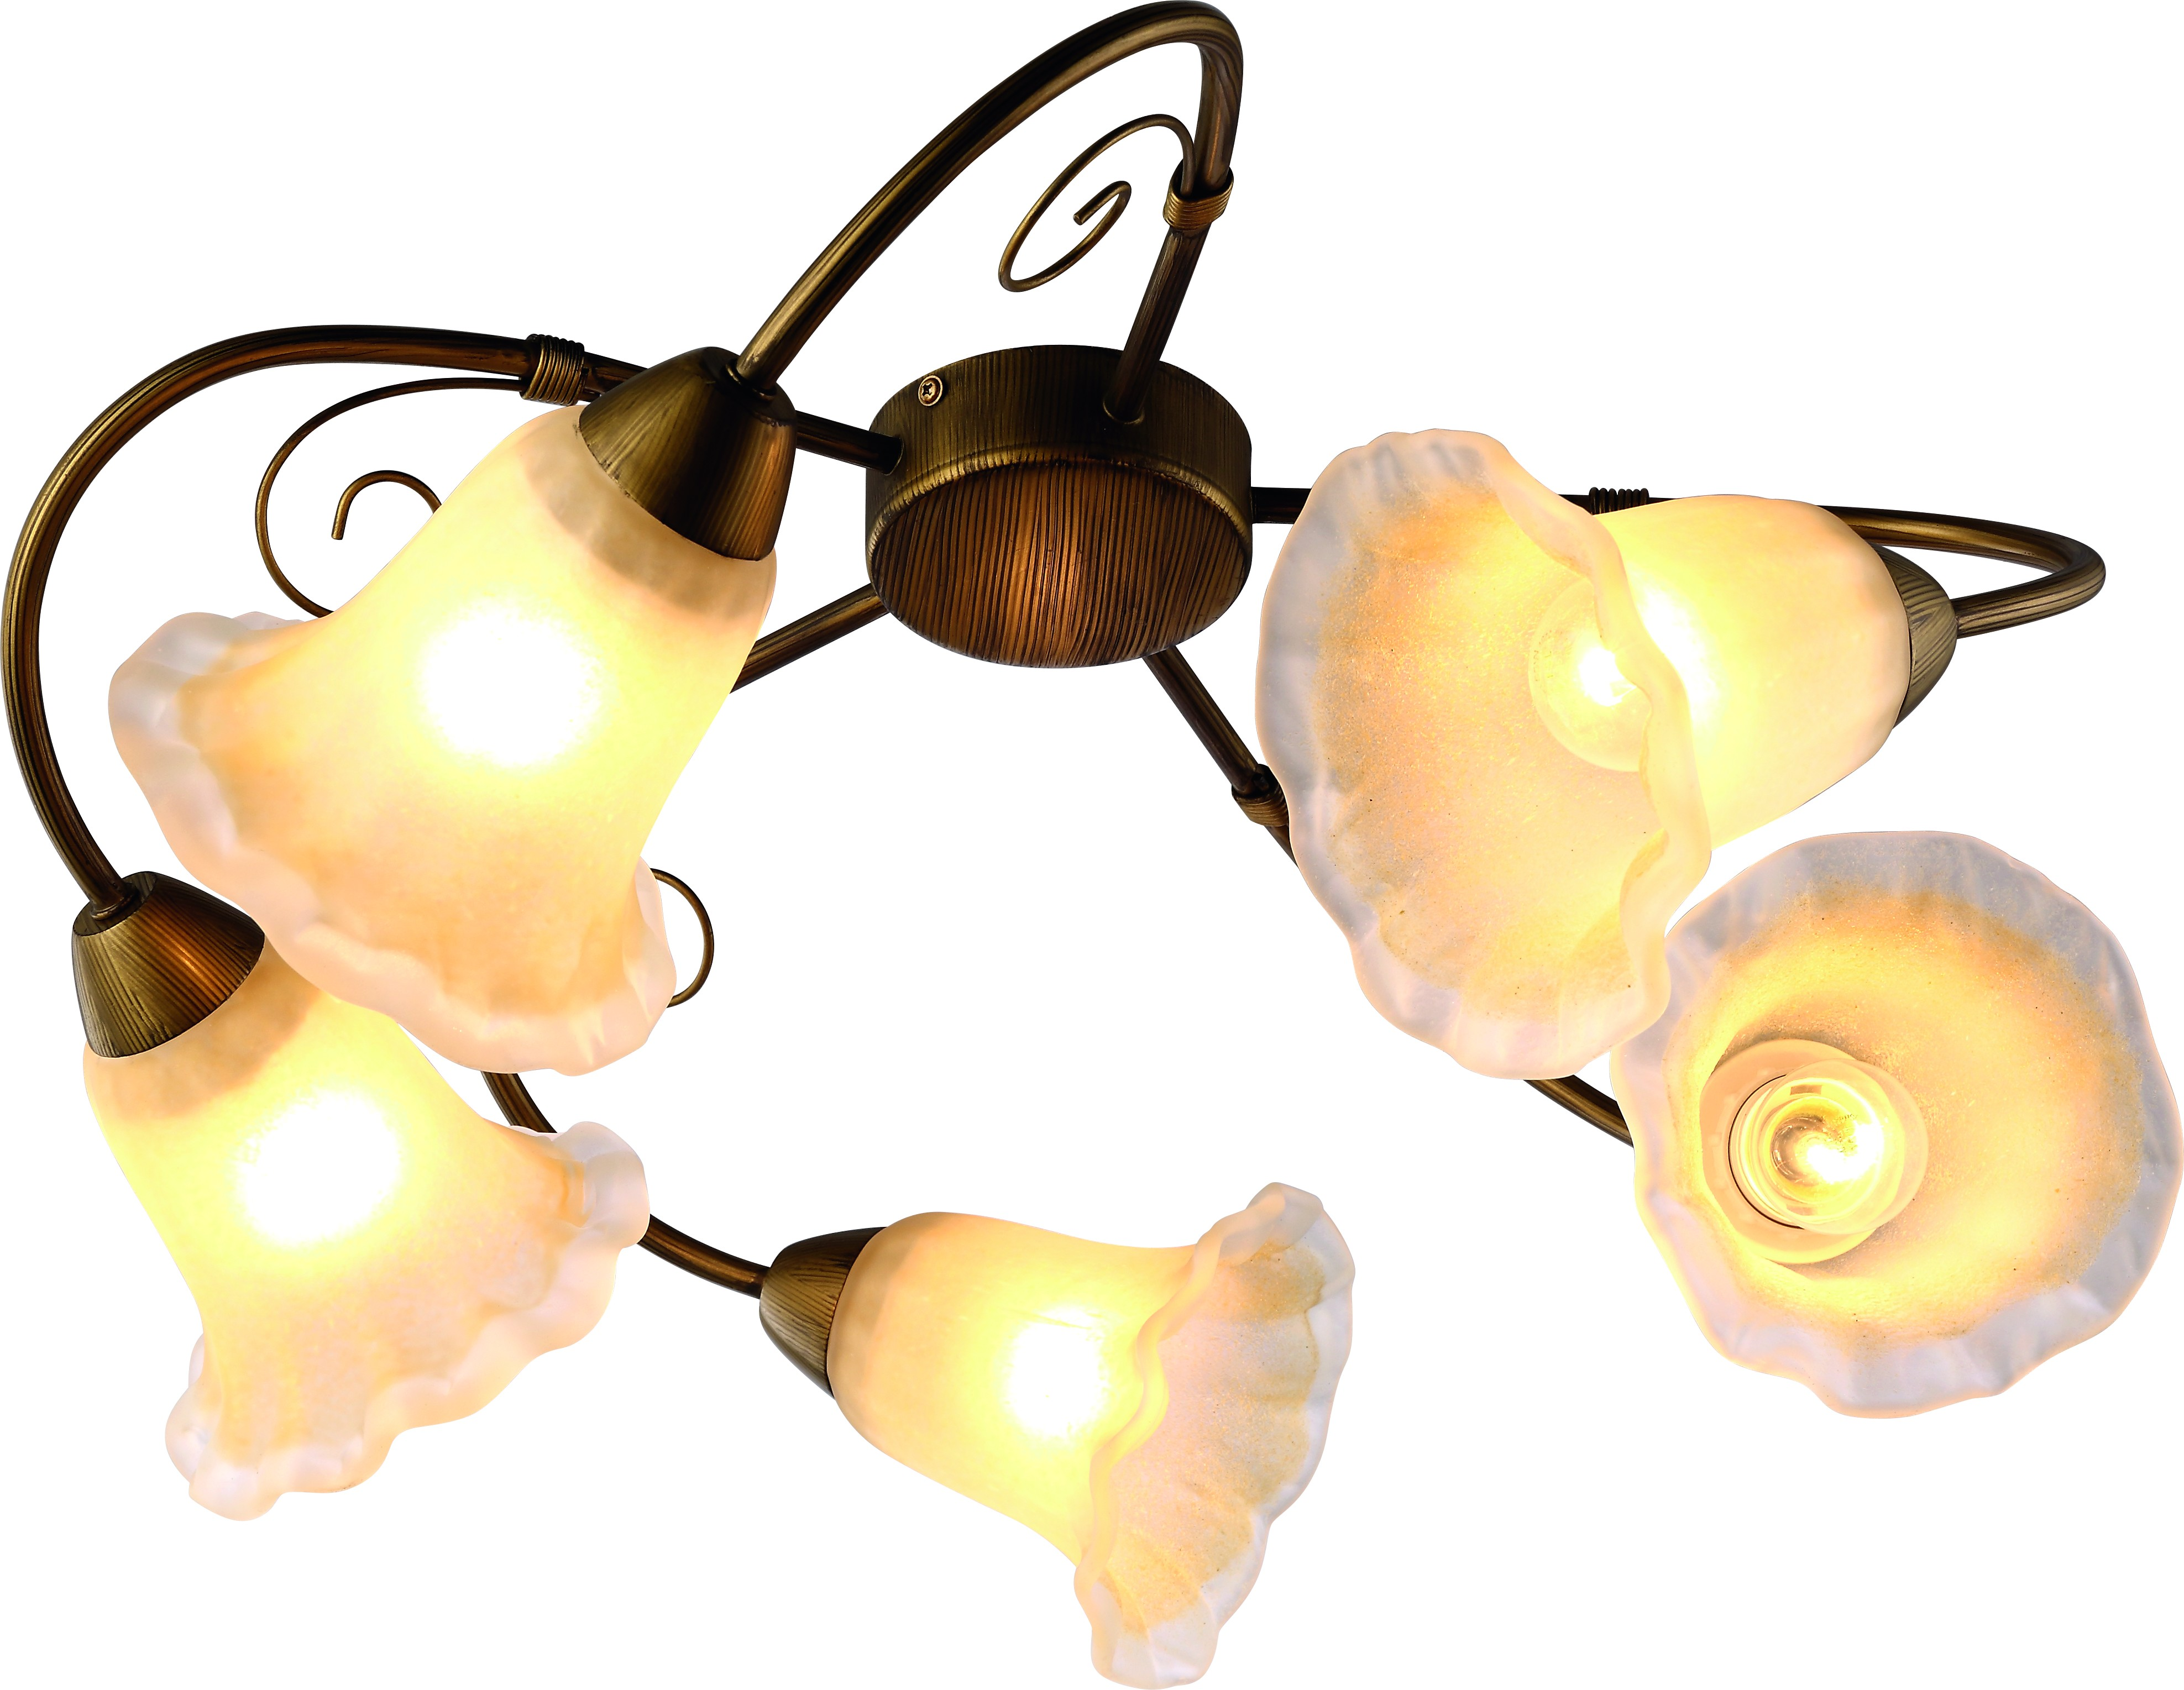 Люстра Arte lamp A9361pl-5br потолочная люстра arte lamp mormorio a9361pl 5br